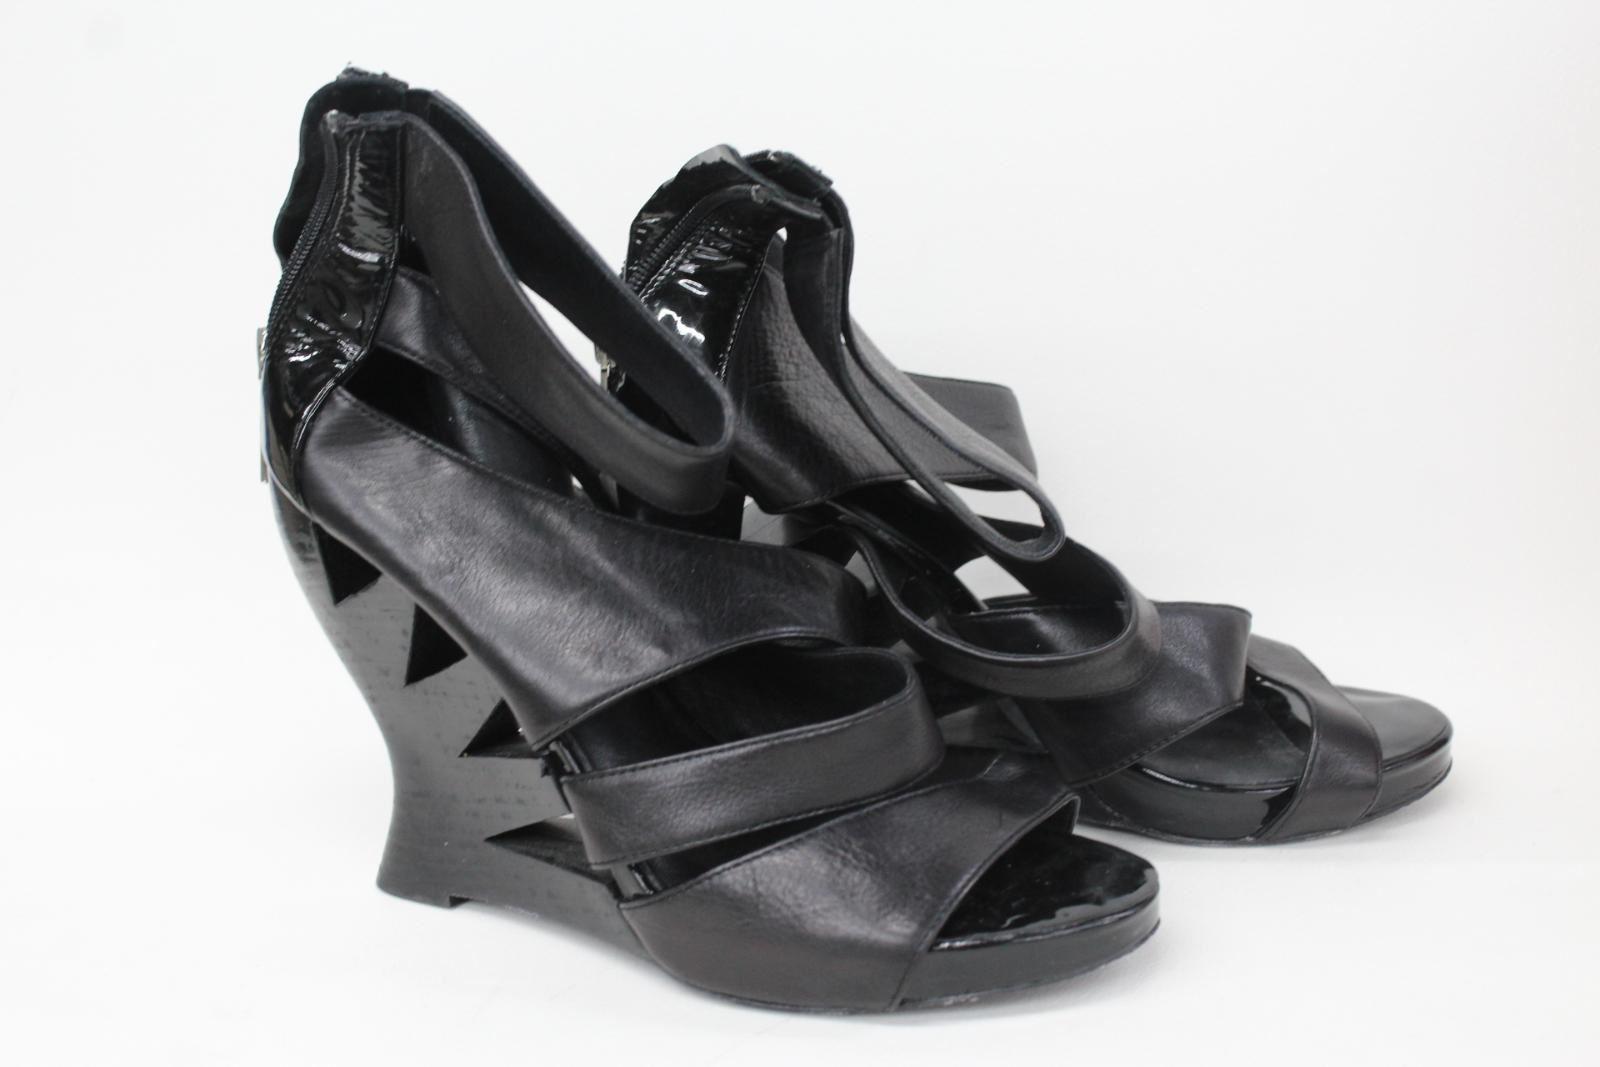 DONALD J PLINER Ladies Black Leather Strappy Wedge Sandals shoes UK7 US9M